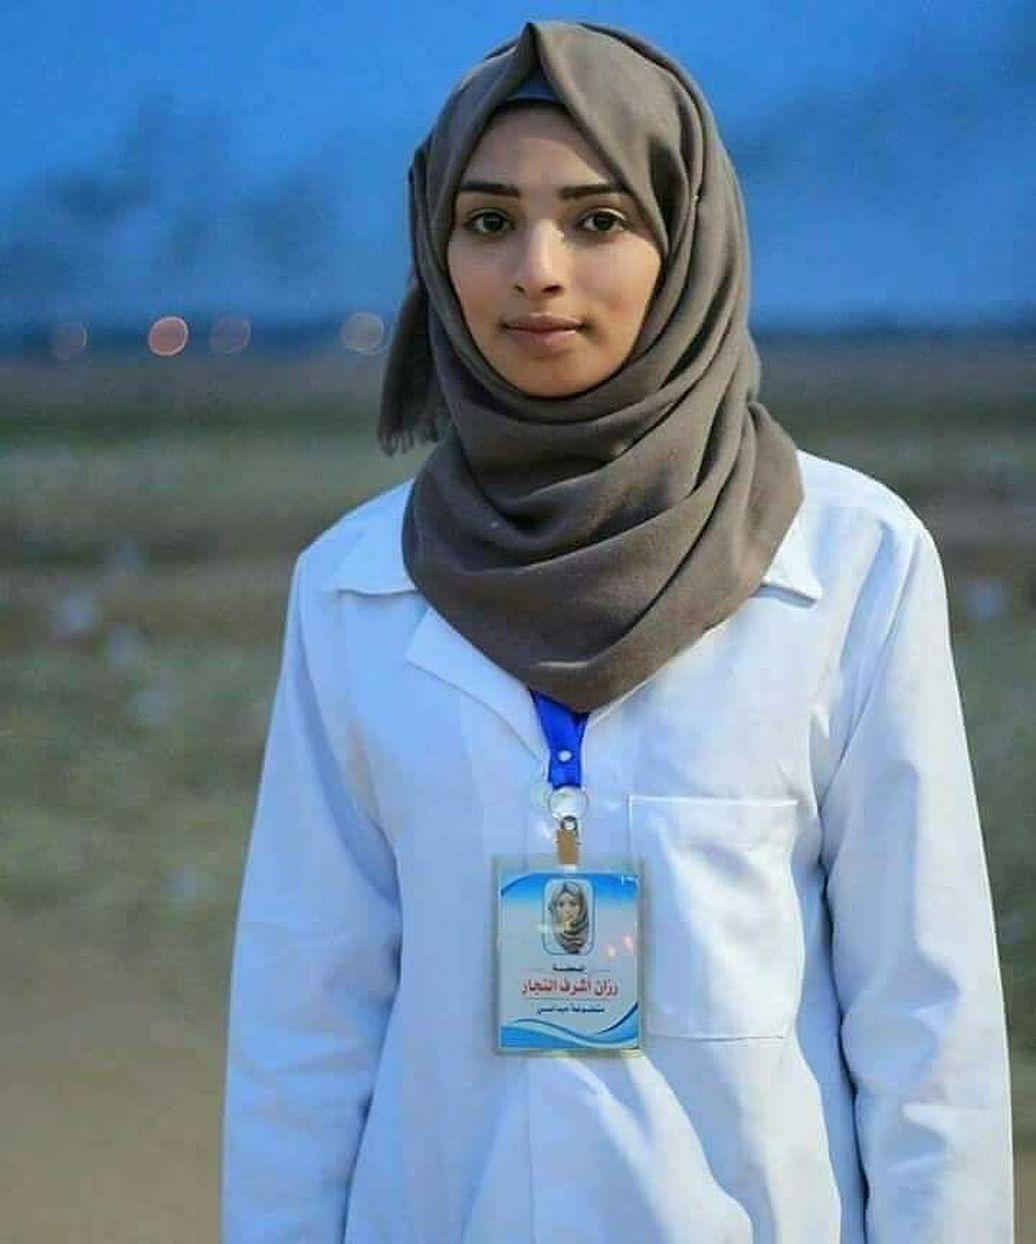 Nursing jobs near me 2019 gaza muslim women hijab